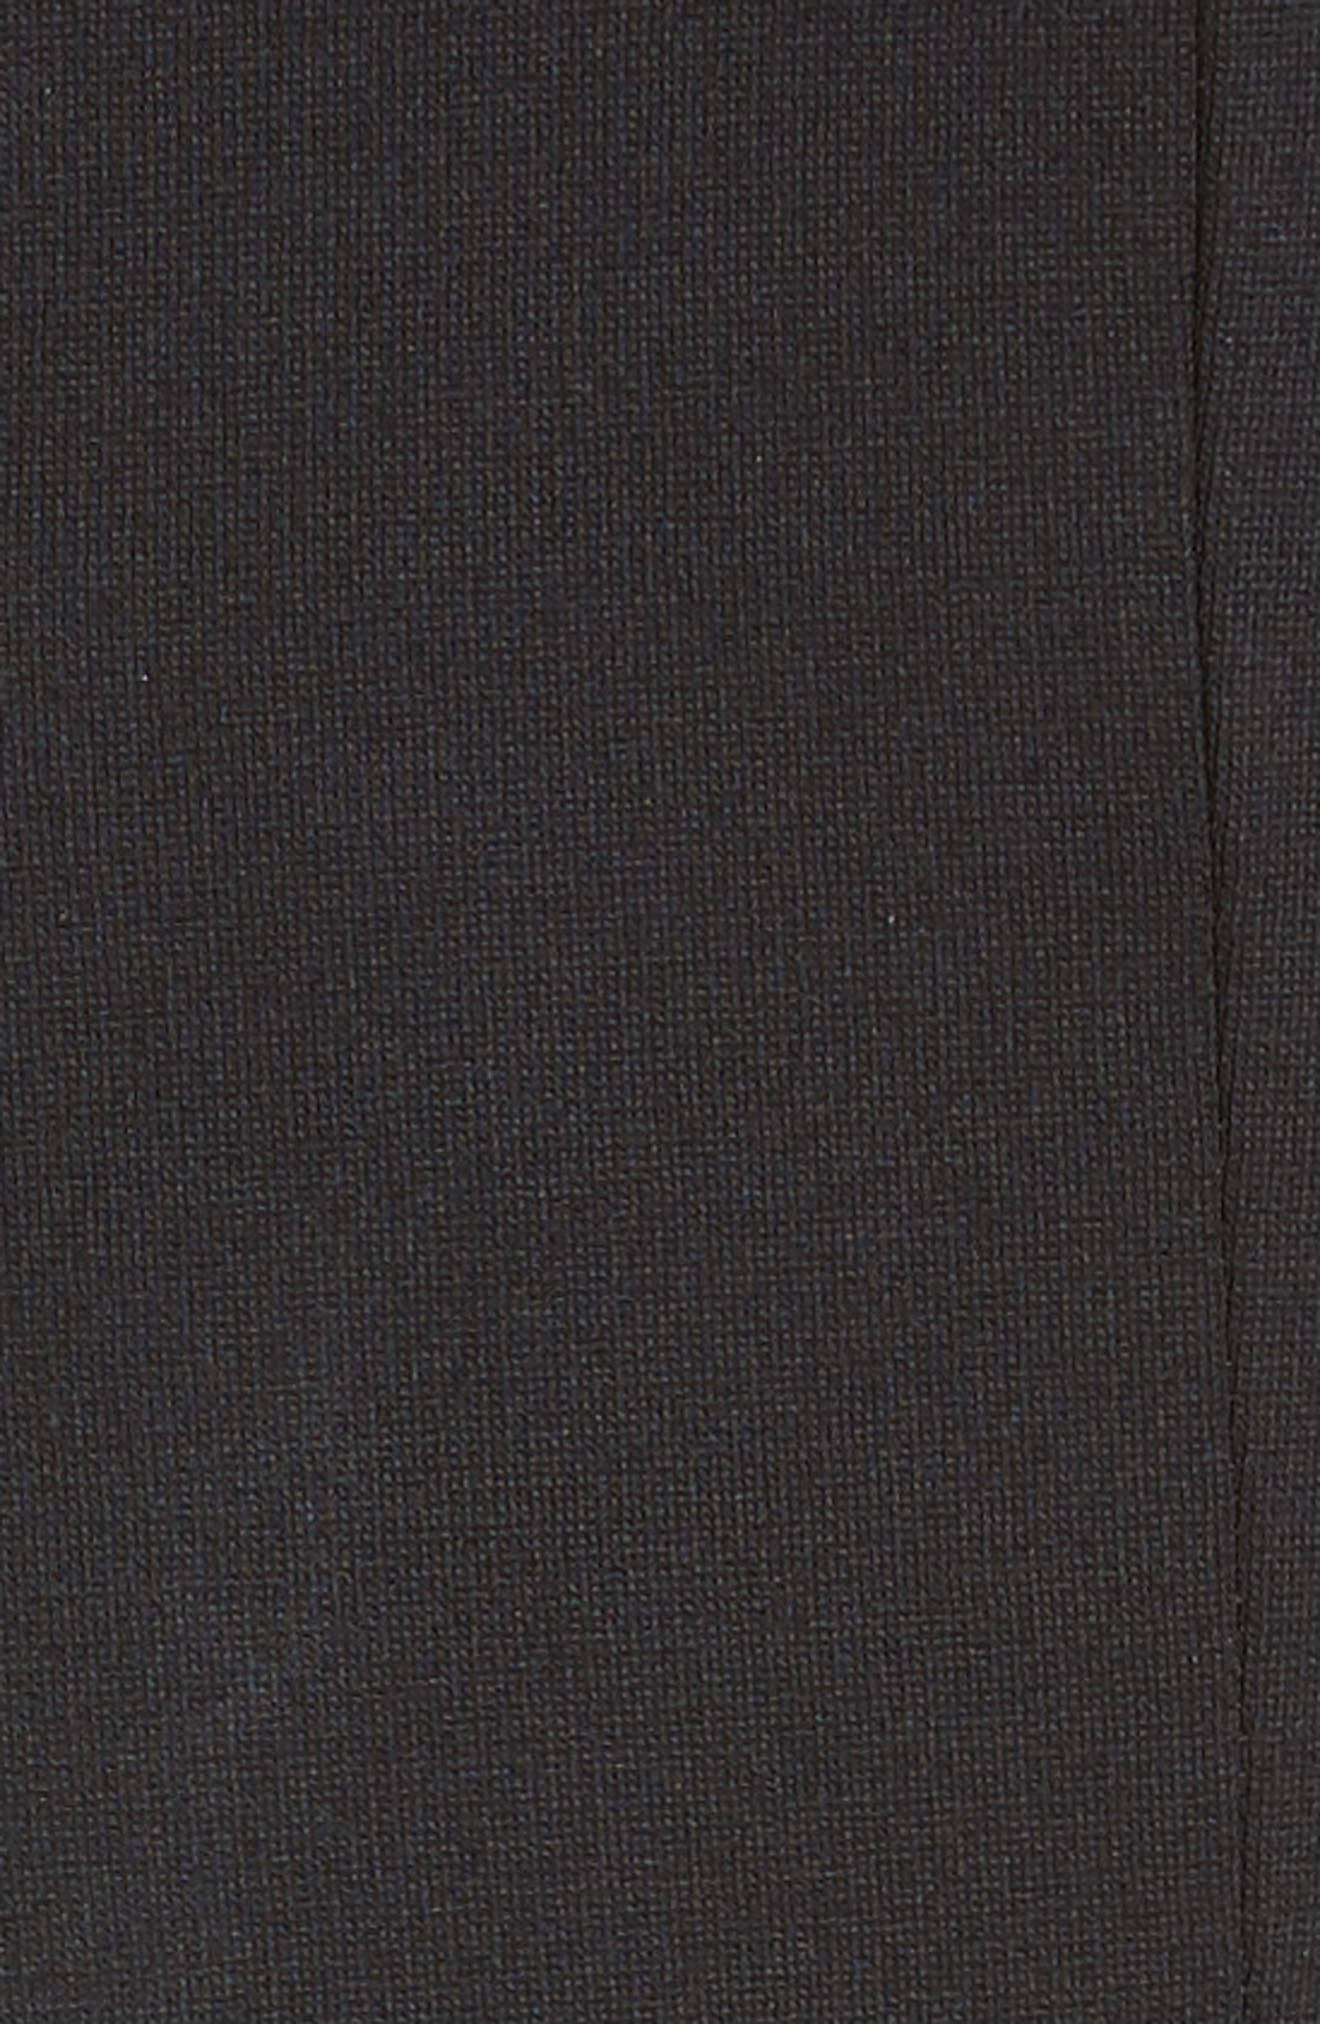 Alternate Image 3  - Armani Collezioni Off the Shoulder Fit & Flare Dress